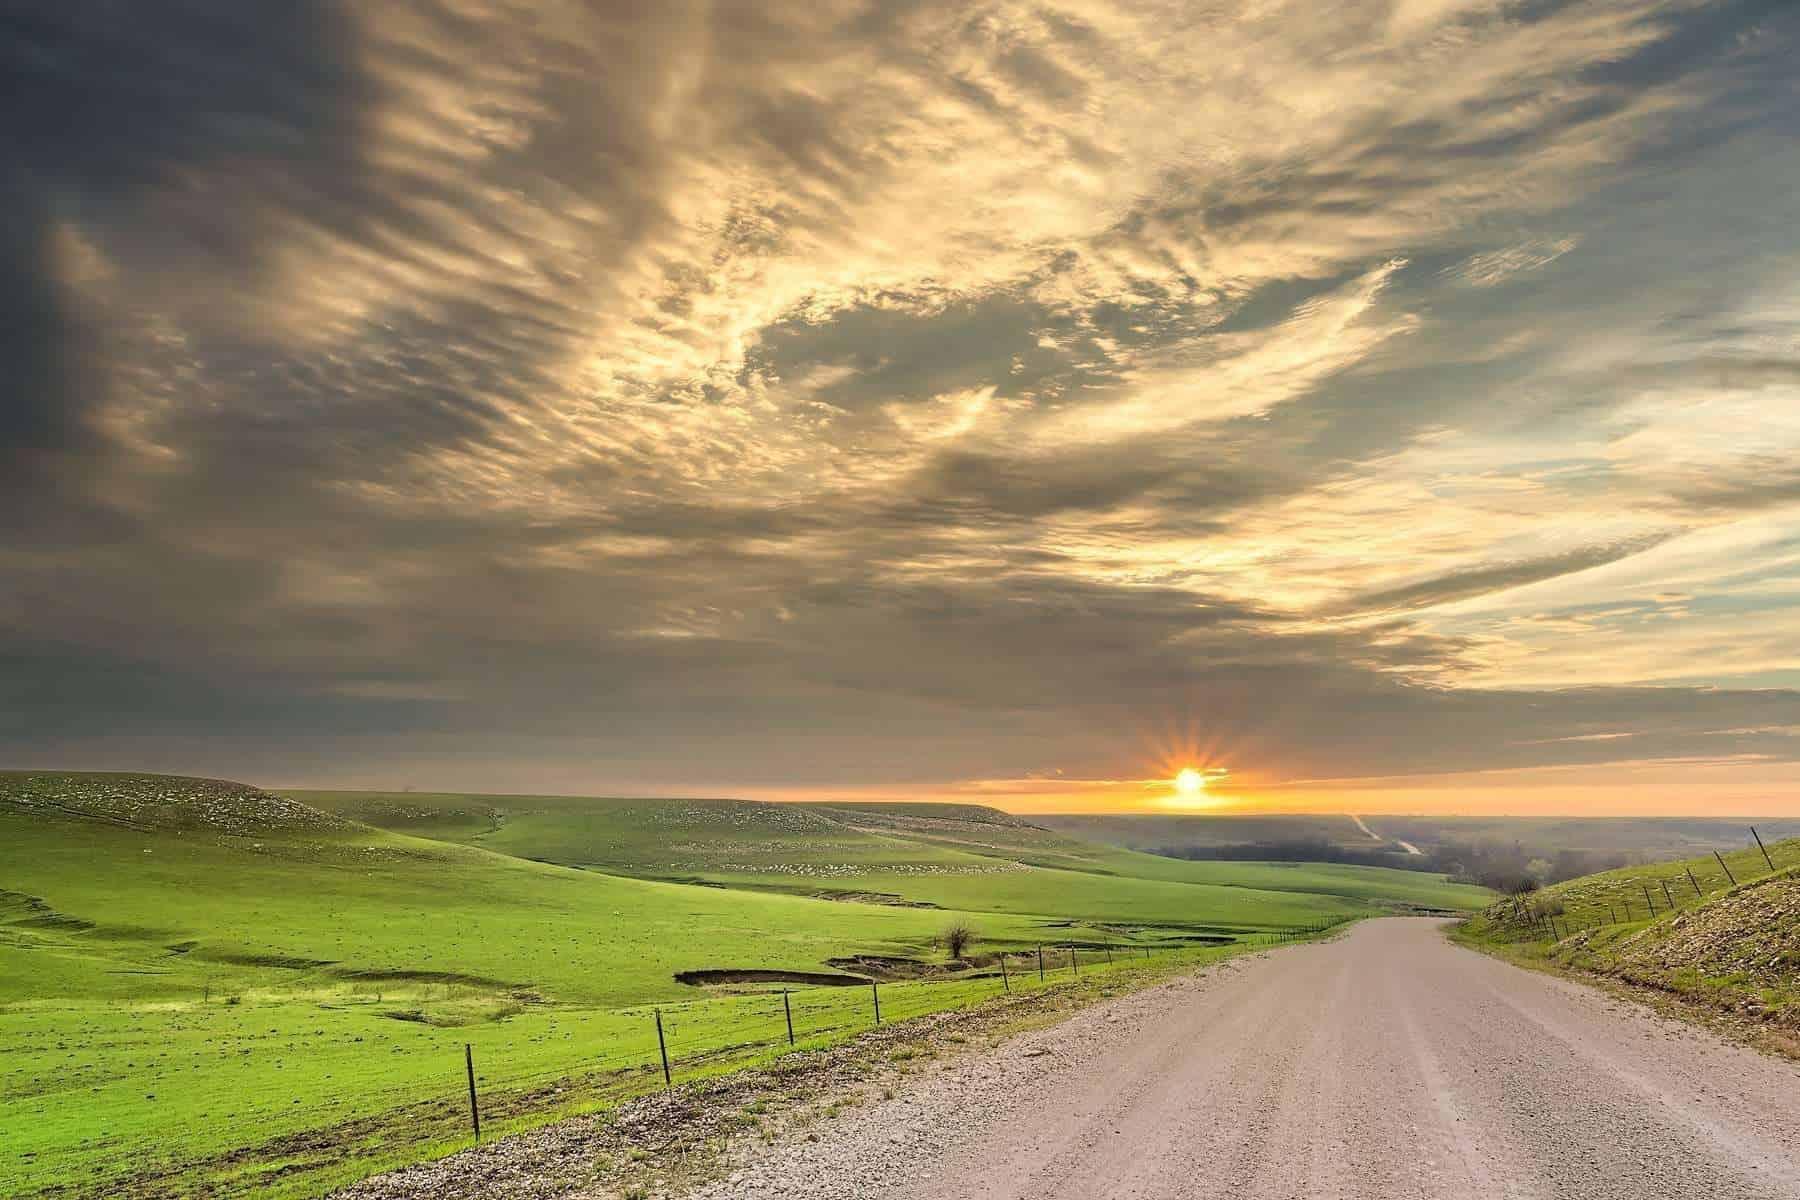 Nature and The Tallgrass Prairie